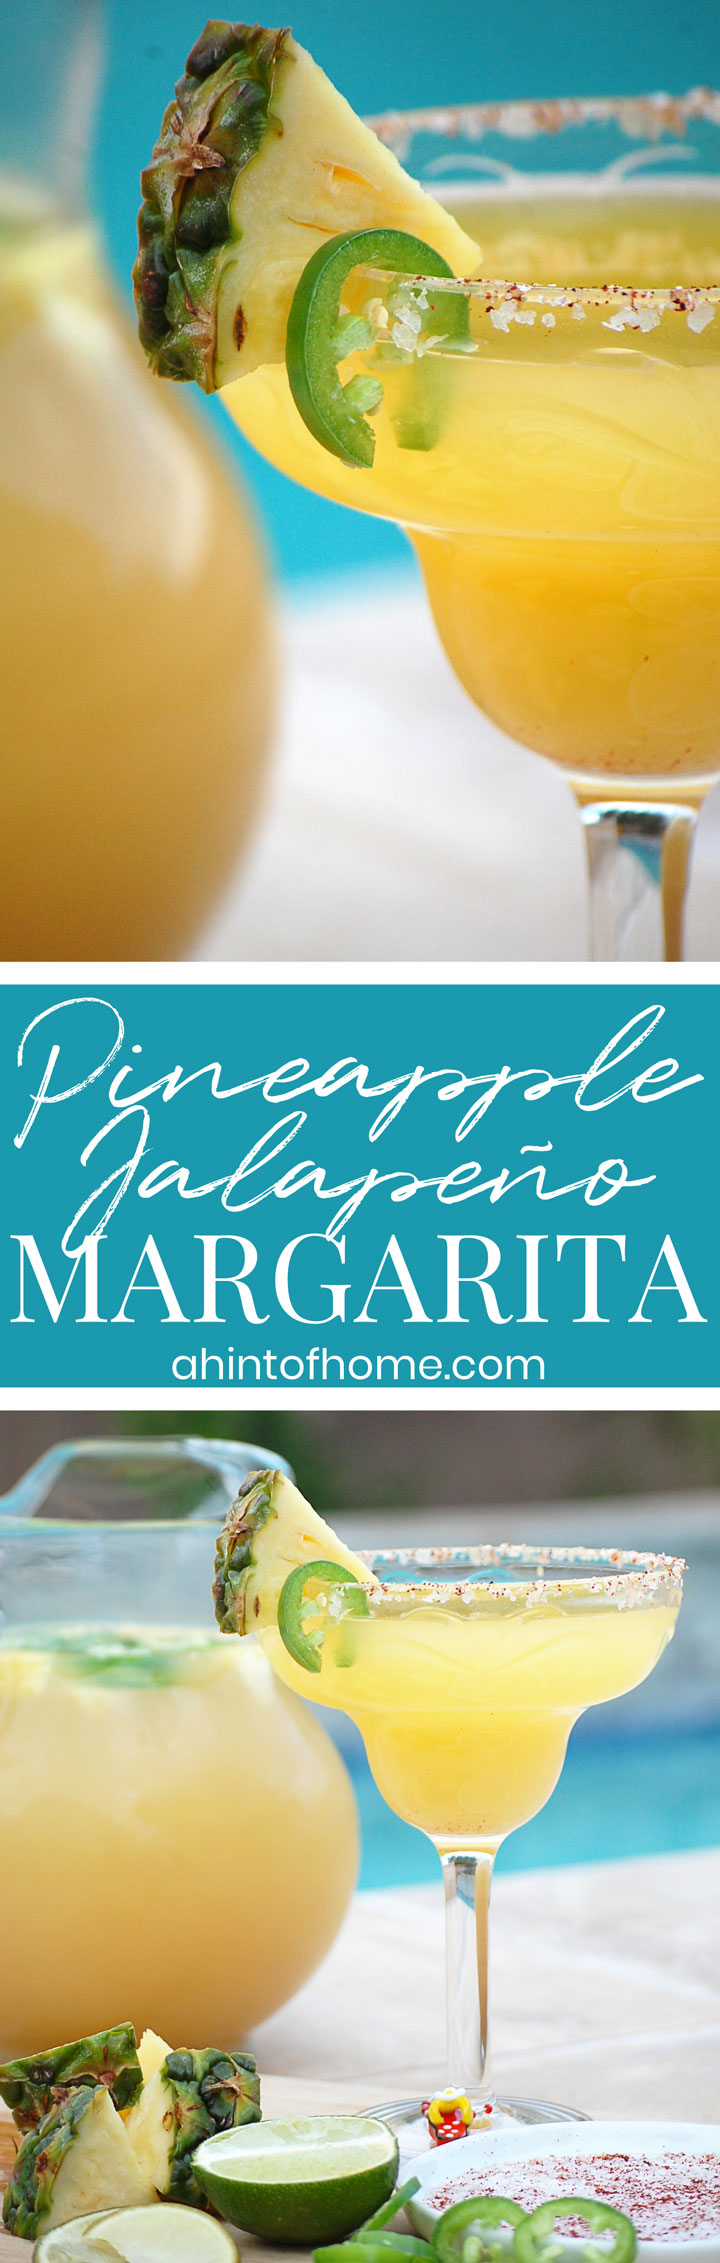 Pineapple Jalapeño Margarita For a Crowd